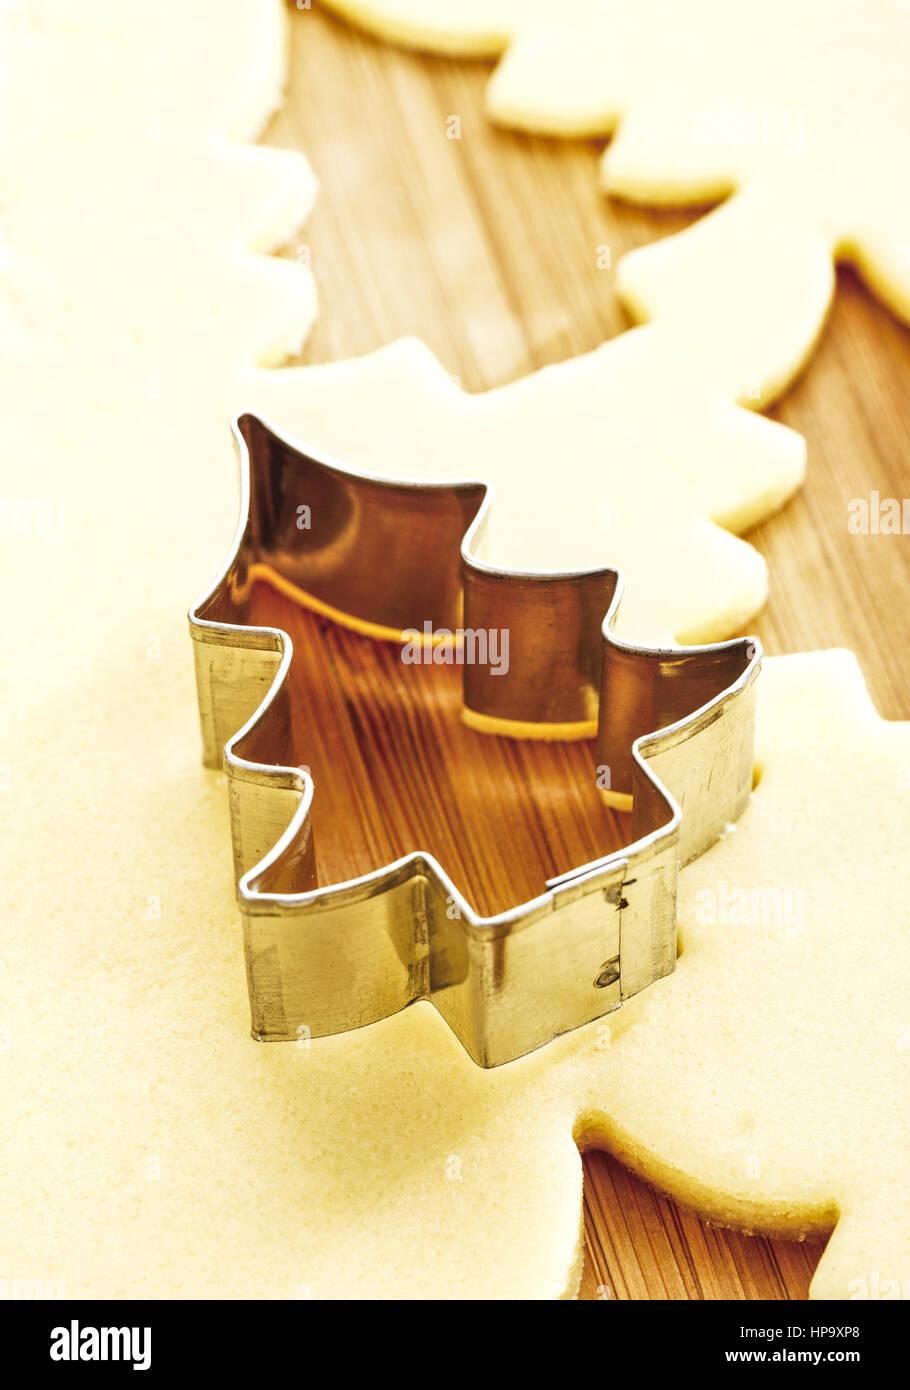 Tannenbaum Puzzle.Tannenbaum Form Stock Photos Tannenbaum Form Stock Images Alamy